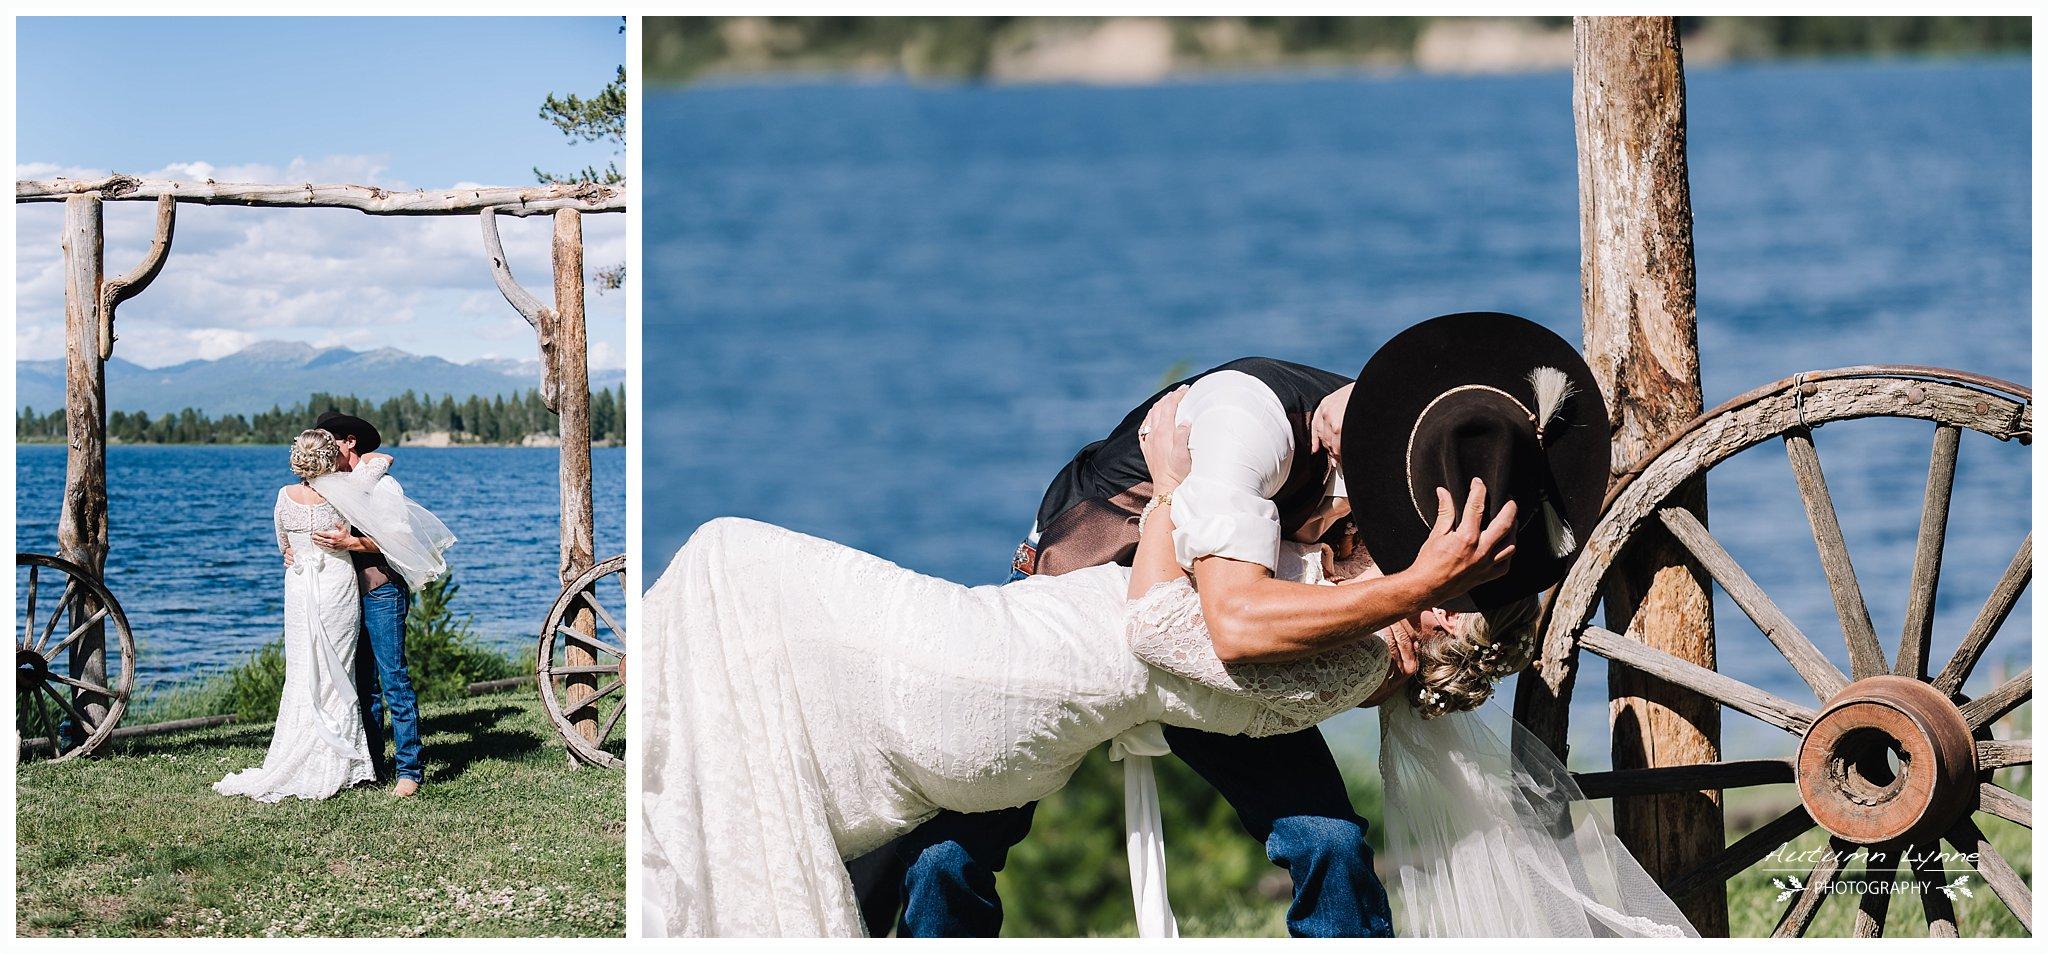 Idahoweddingphotographers